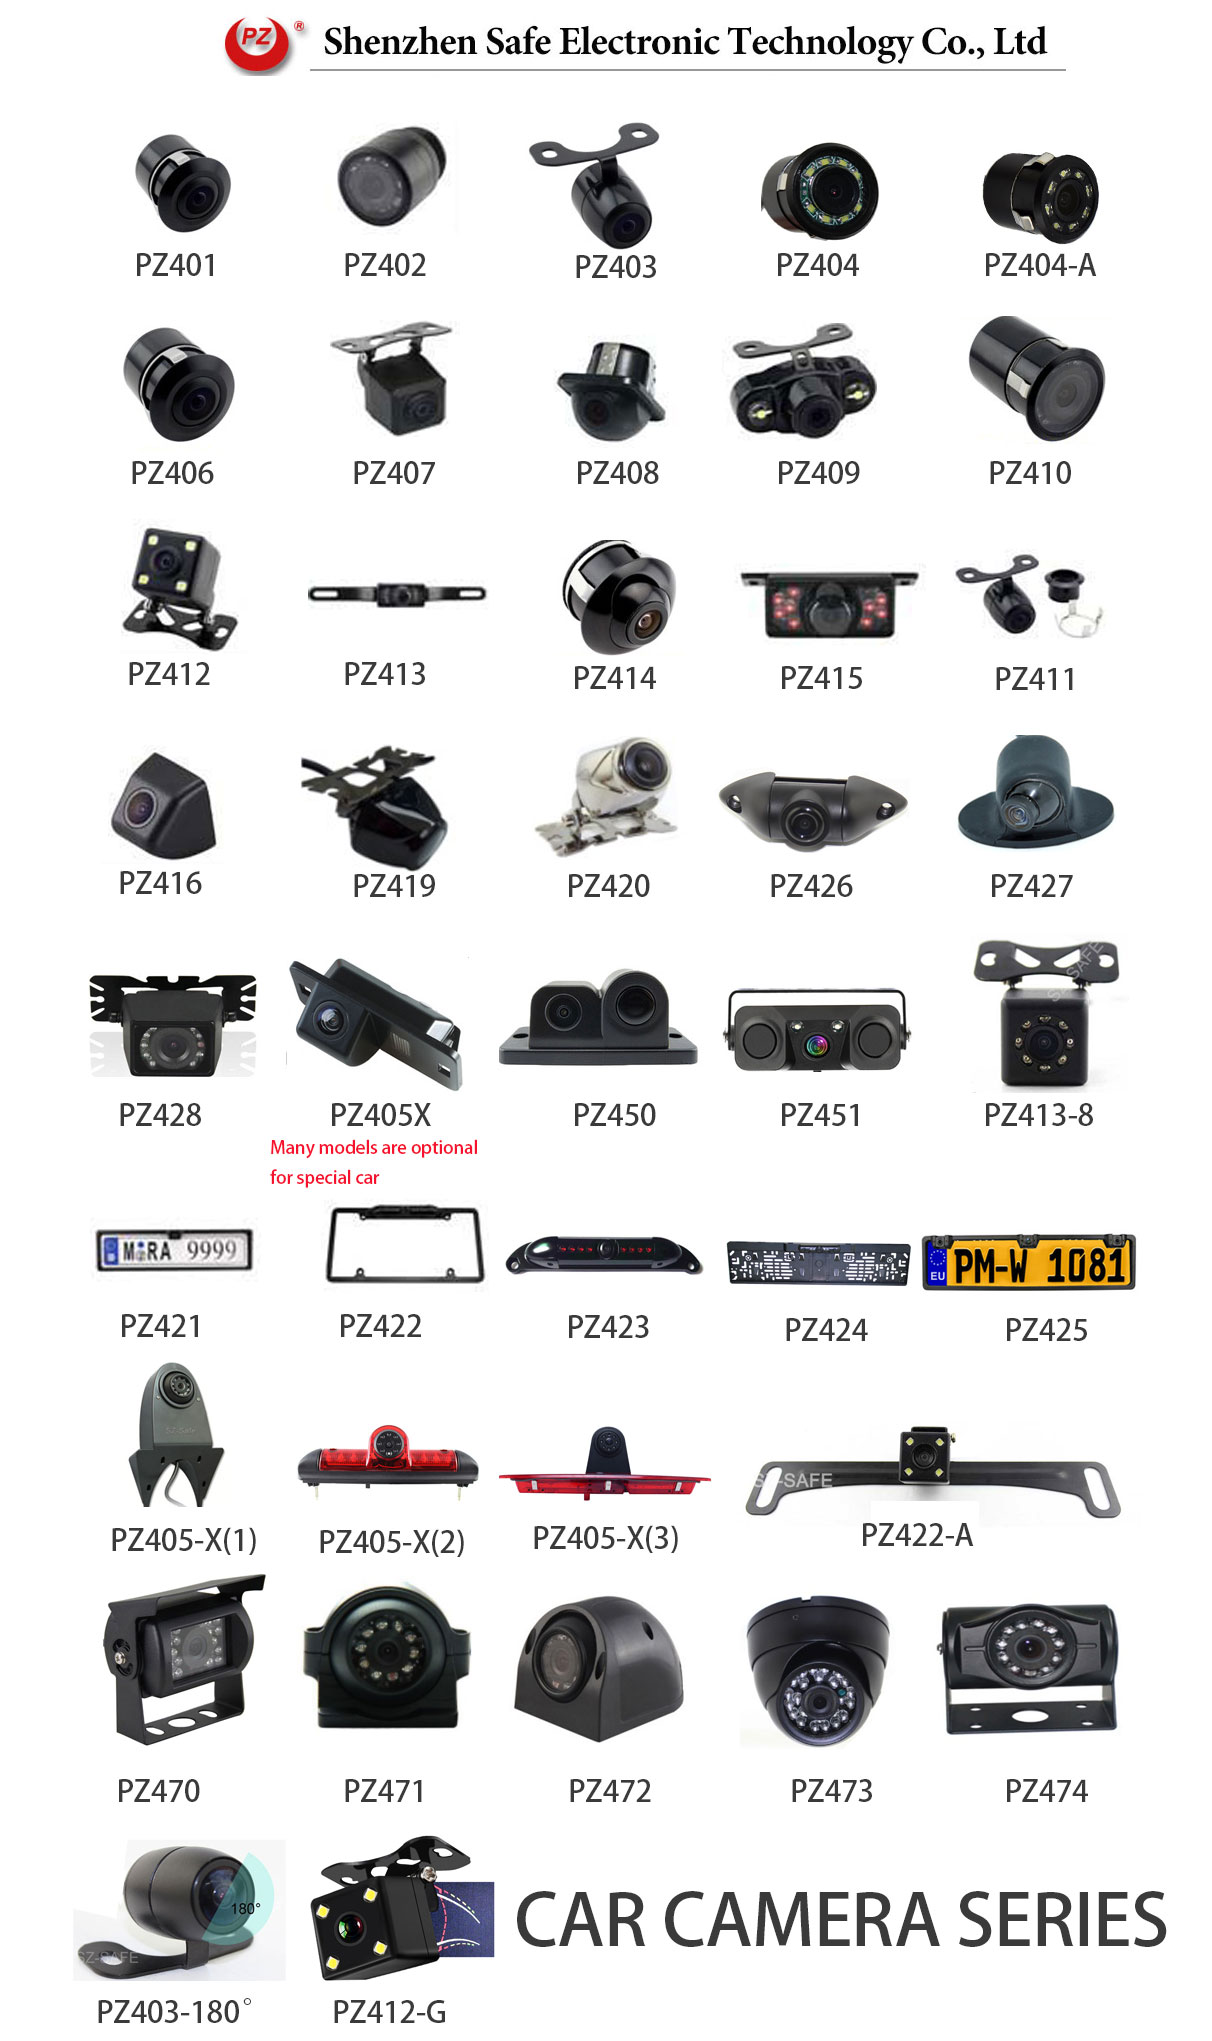 4.3inch Lcd Display Car Reverse Lcd Monitor Car Camera